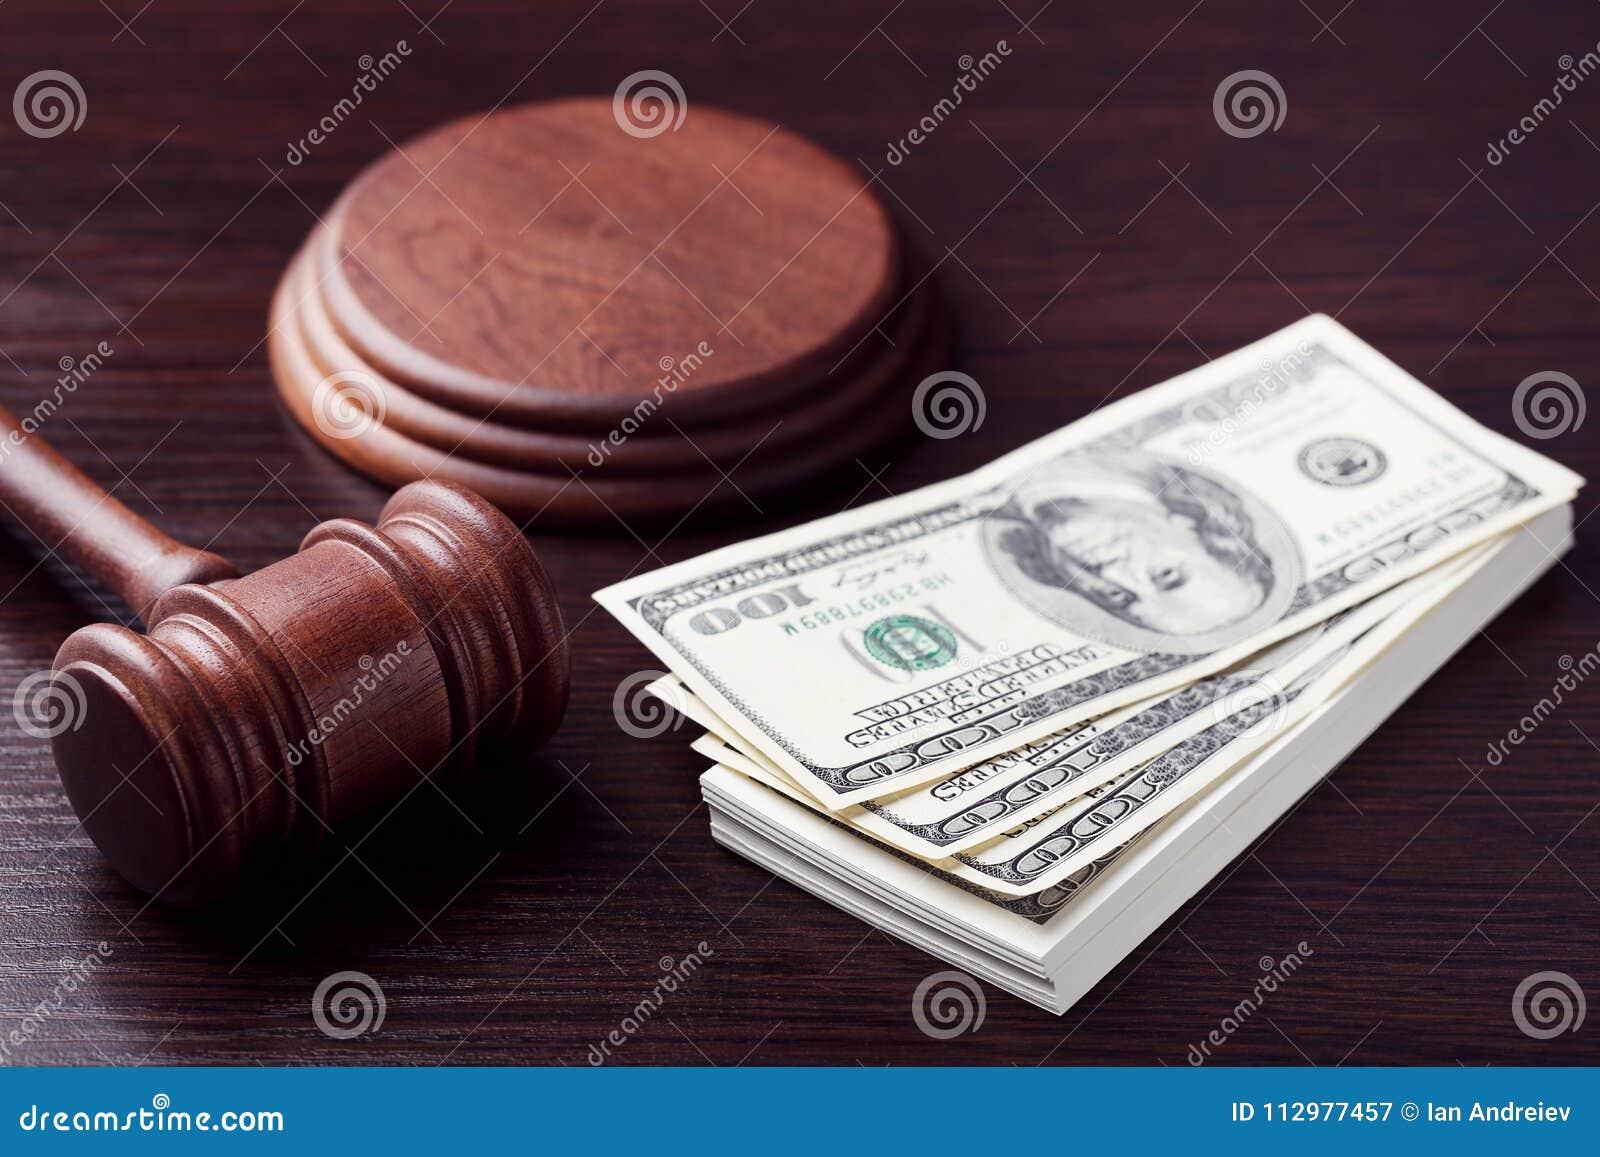 Judge gavel with dollars